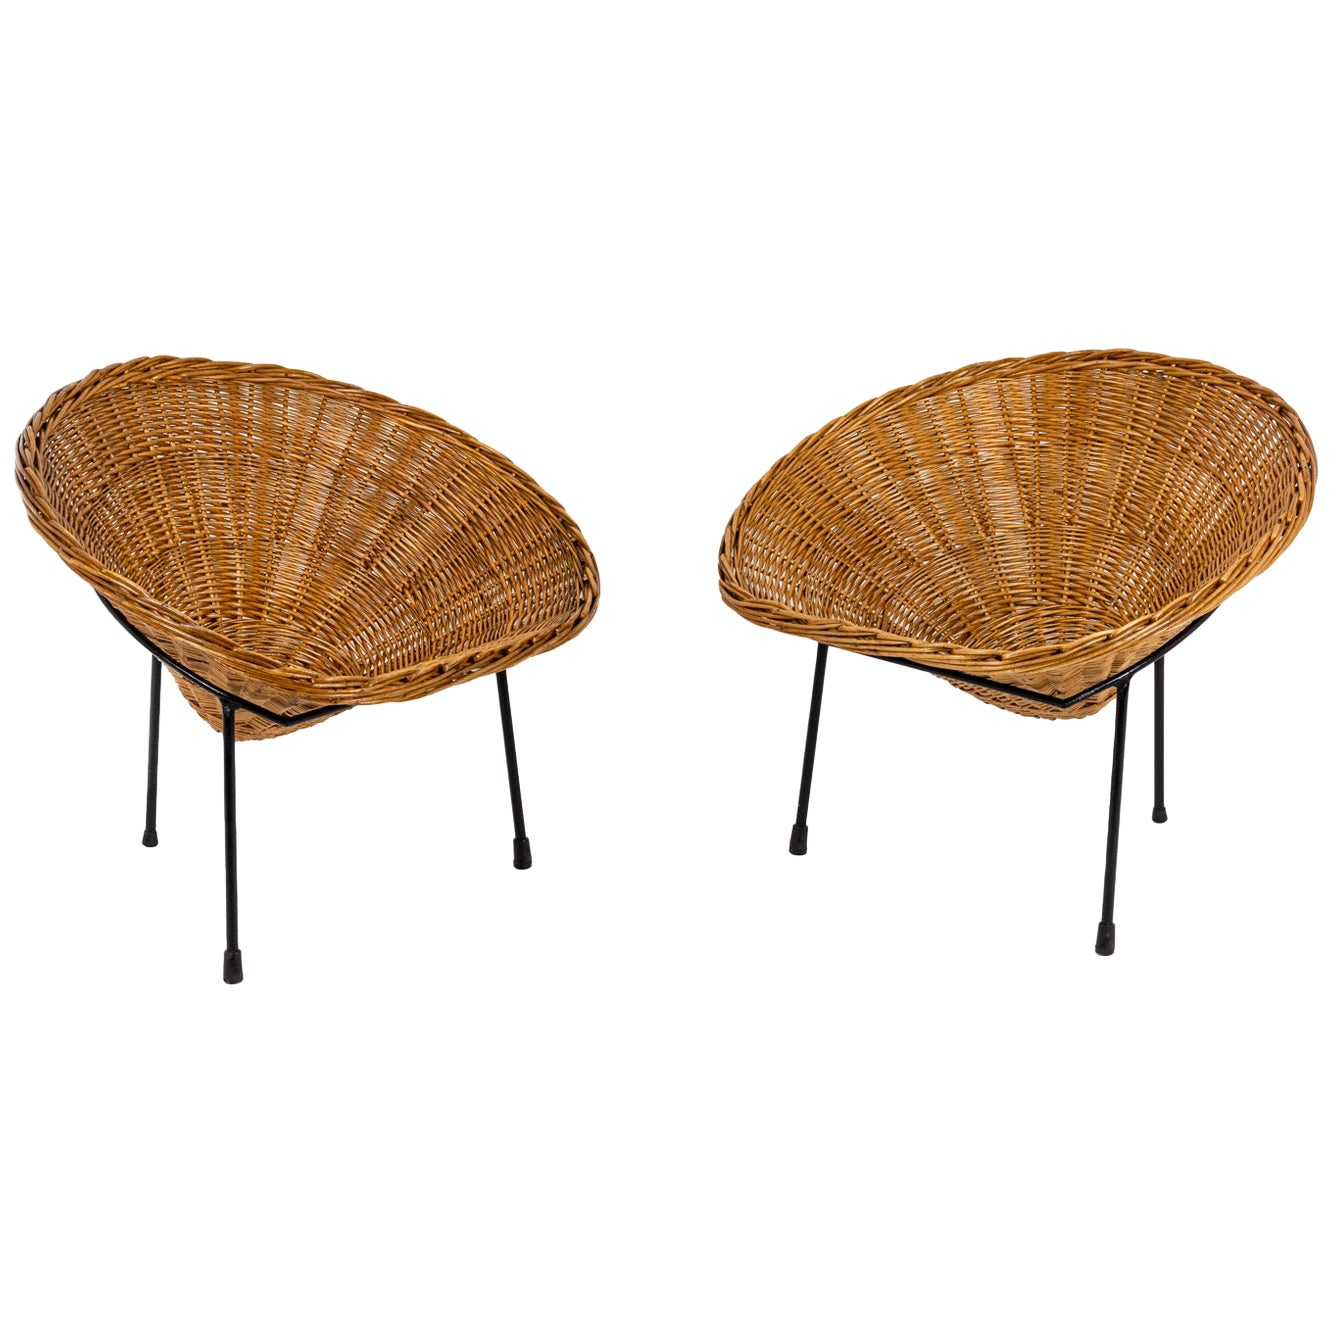 "Roberto Mango, Pair of Armchairs ""Basket"" in Wicker, 1950s"